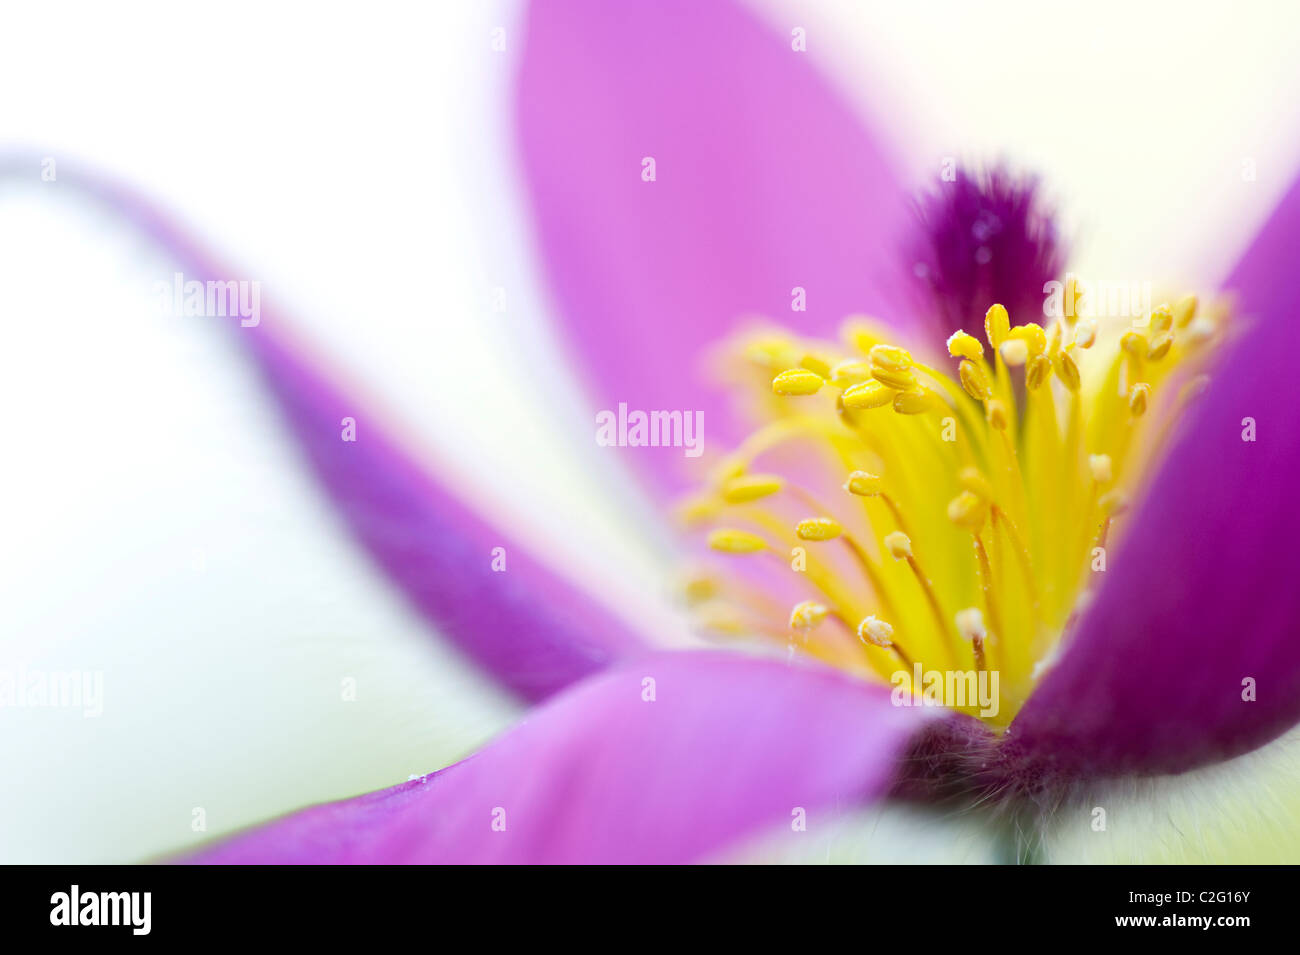 A single purple flower head of Pulsatilla vulgaris - Pasque flower - Stock Image